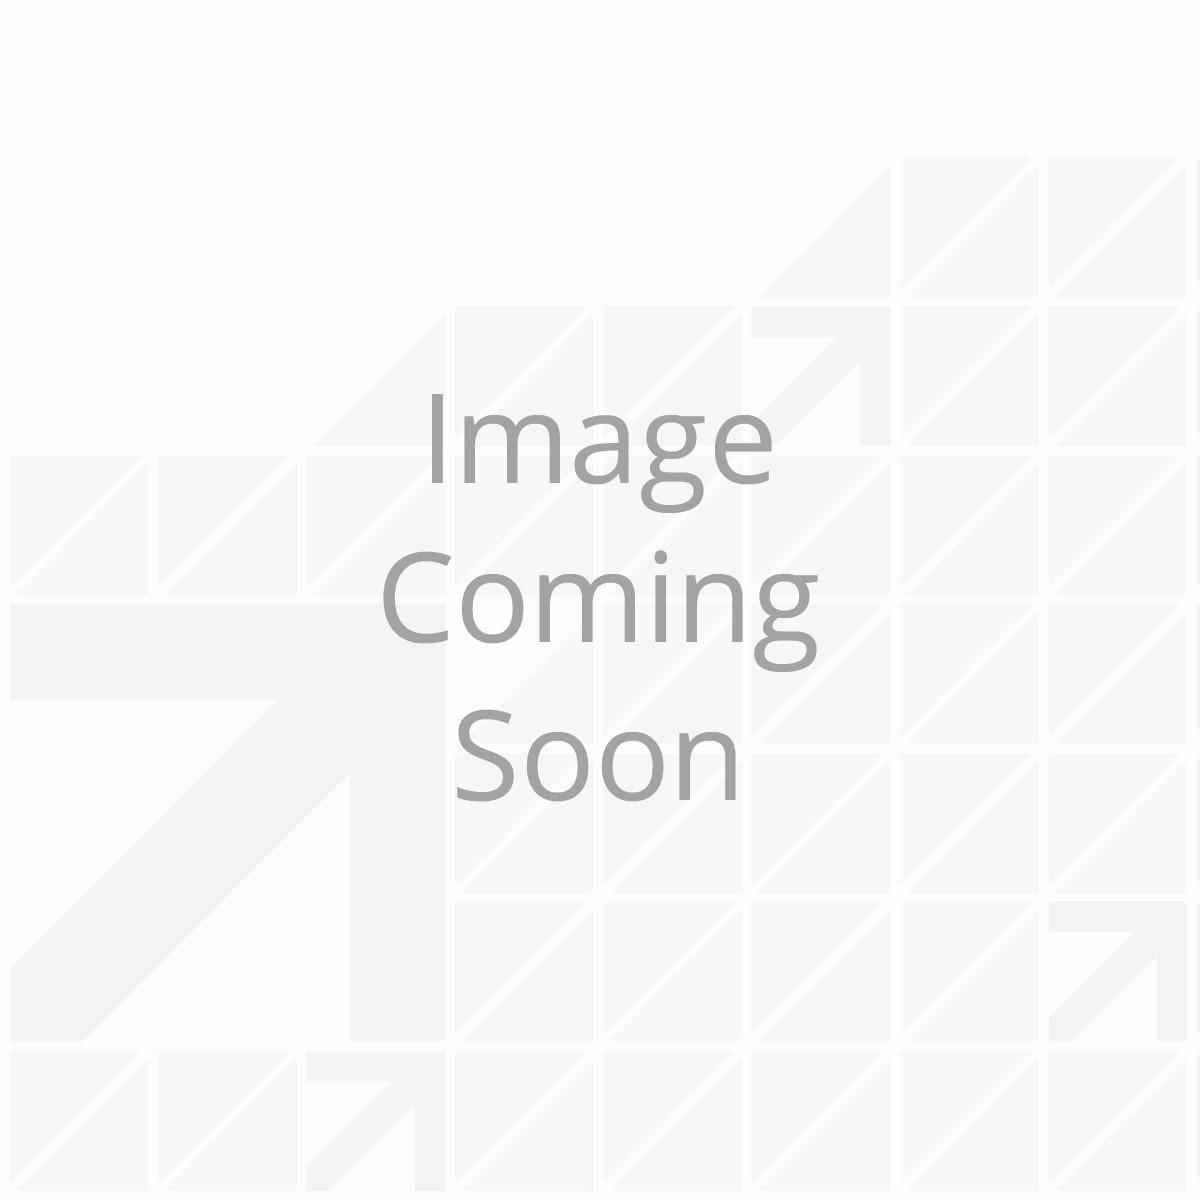 Axle Hardware Kit - Various Sizes